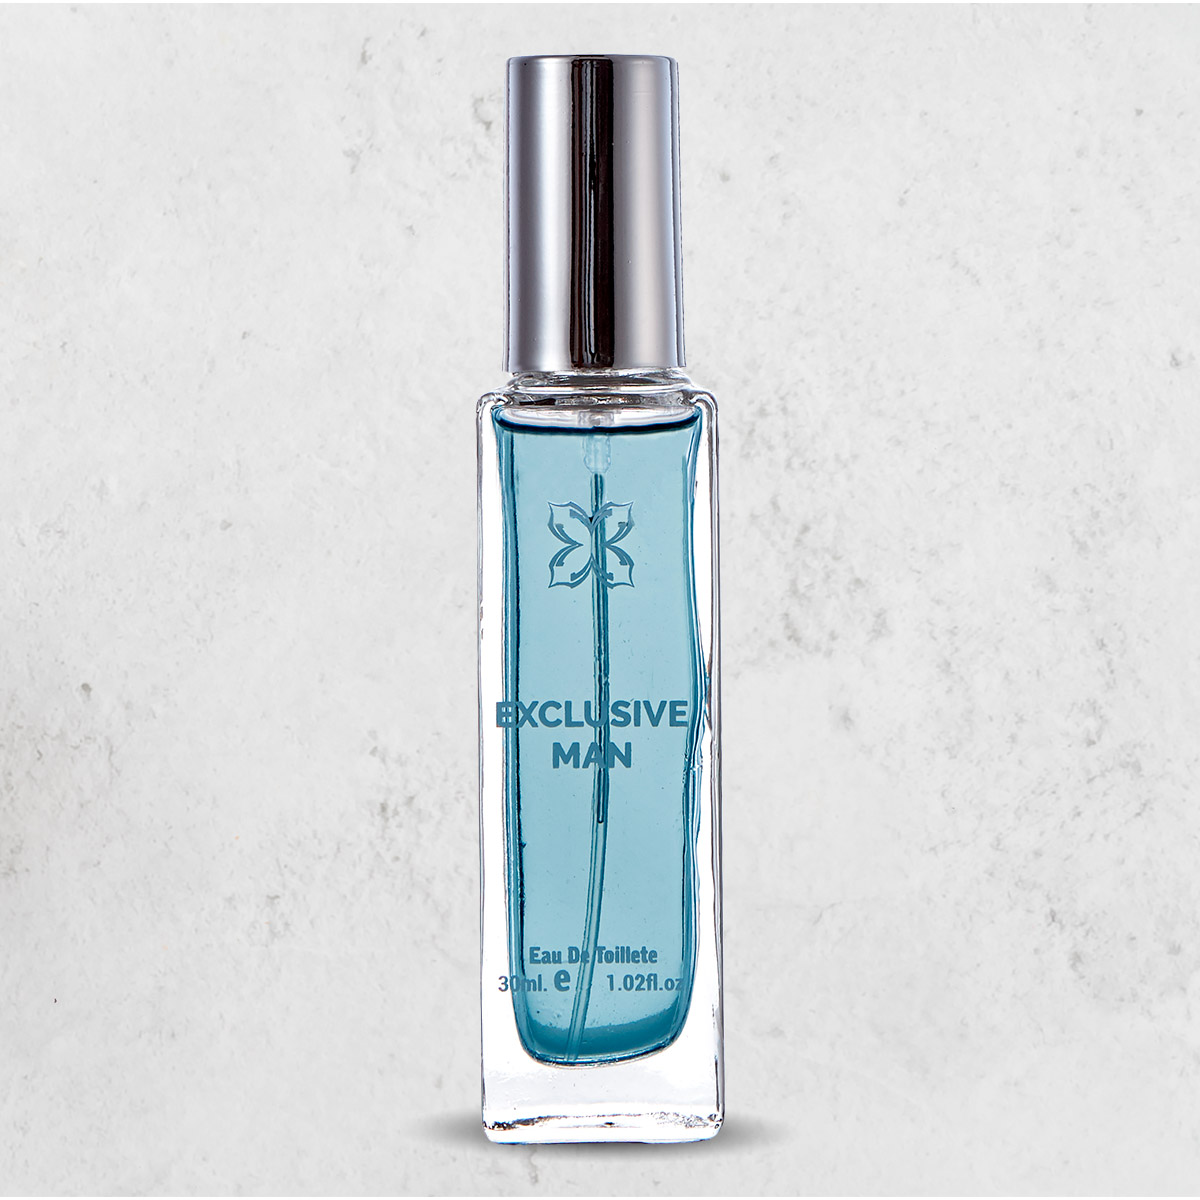 Essenciart Exclusive Perfume Masculino Importado Edt 30ml